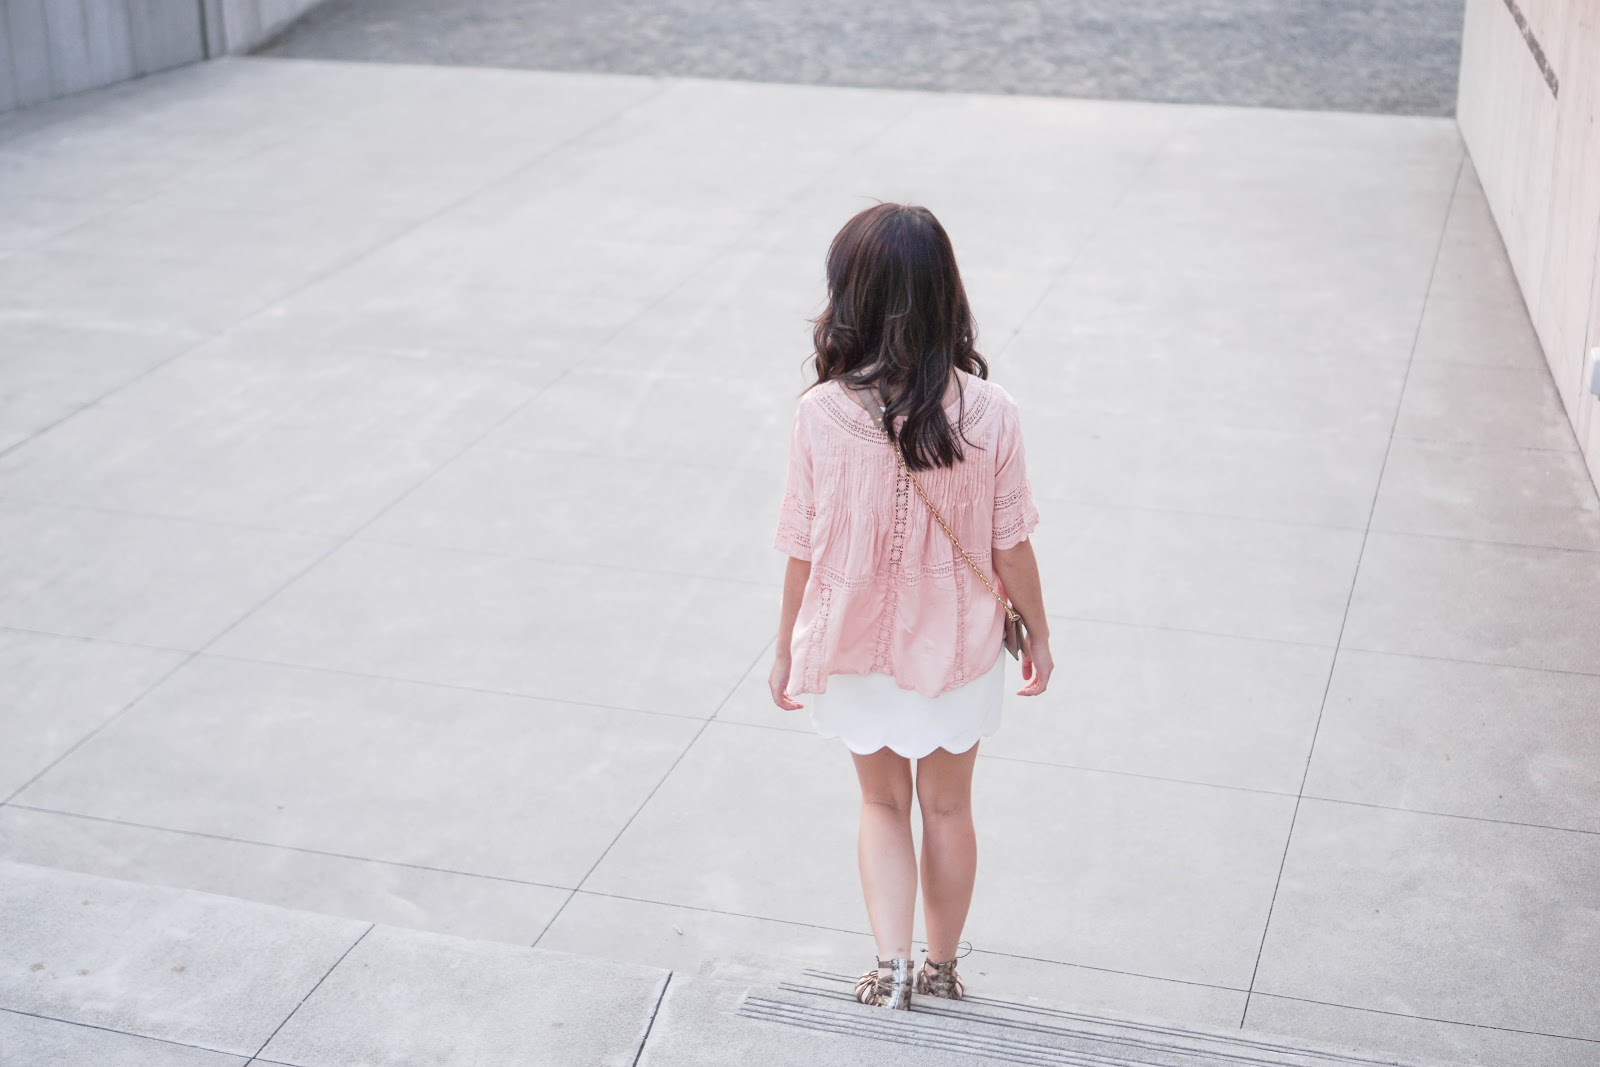 828bcc8cd Balancing Act: Amuse Society Clover Top w/ Topshop Scallop Miniskirt ...